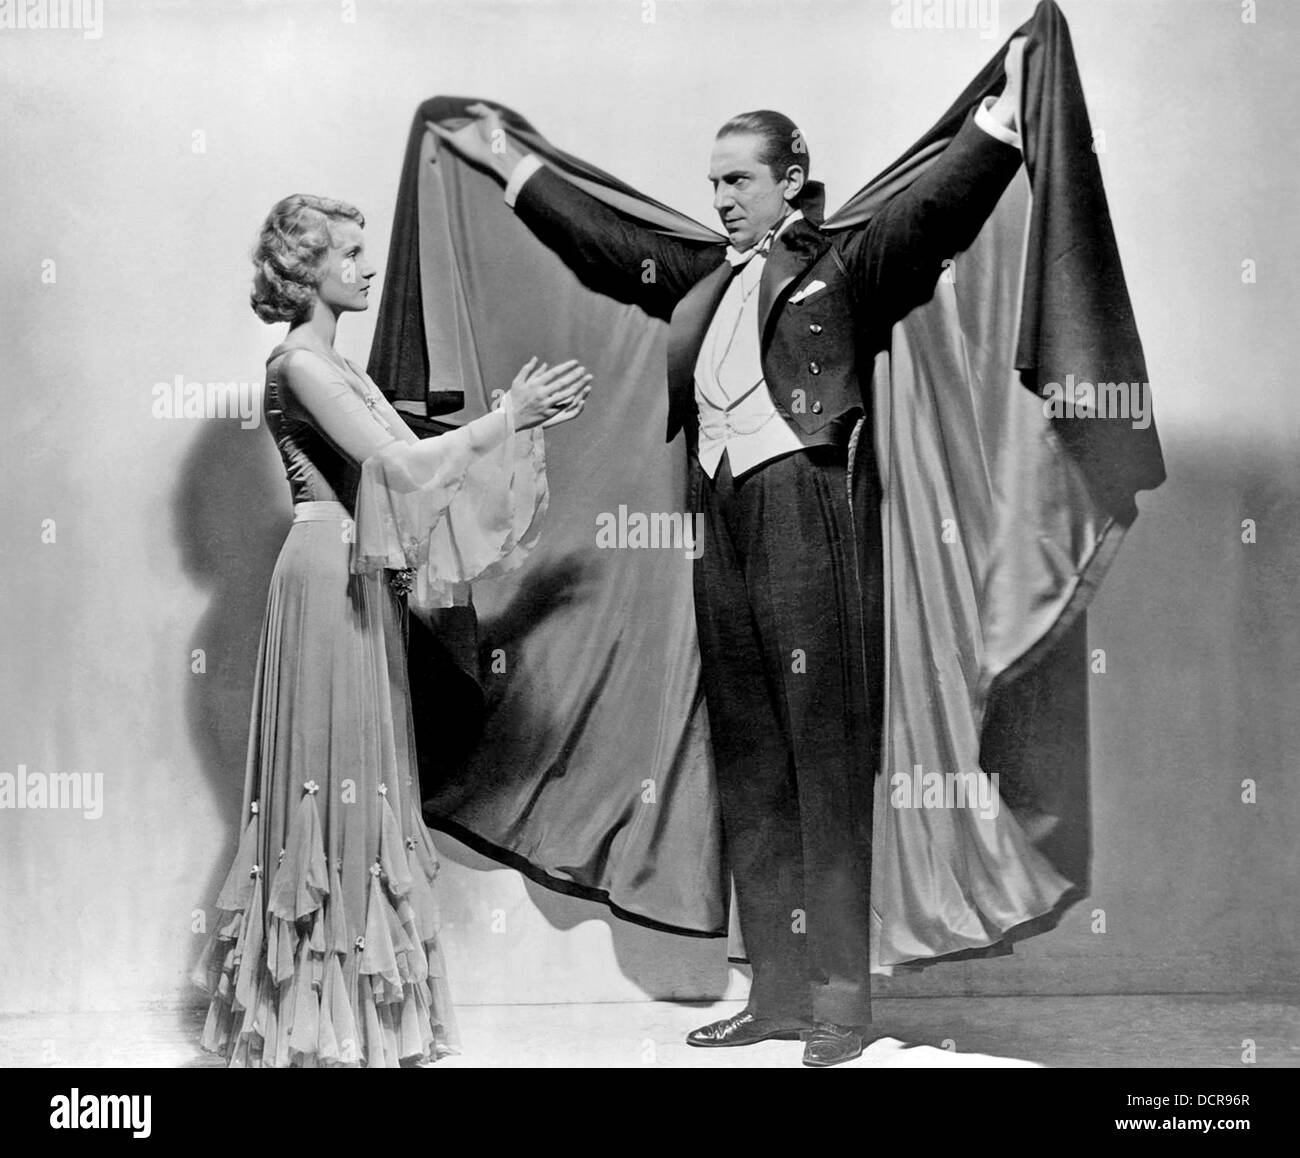 DRACULA 1931 Universal Pictures film avec Bela Lugosi et Helen Chandler Photo Stock